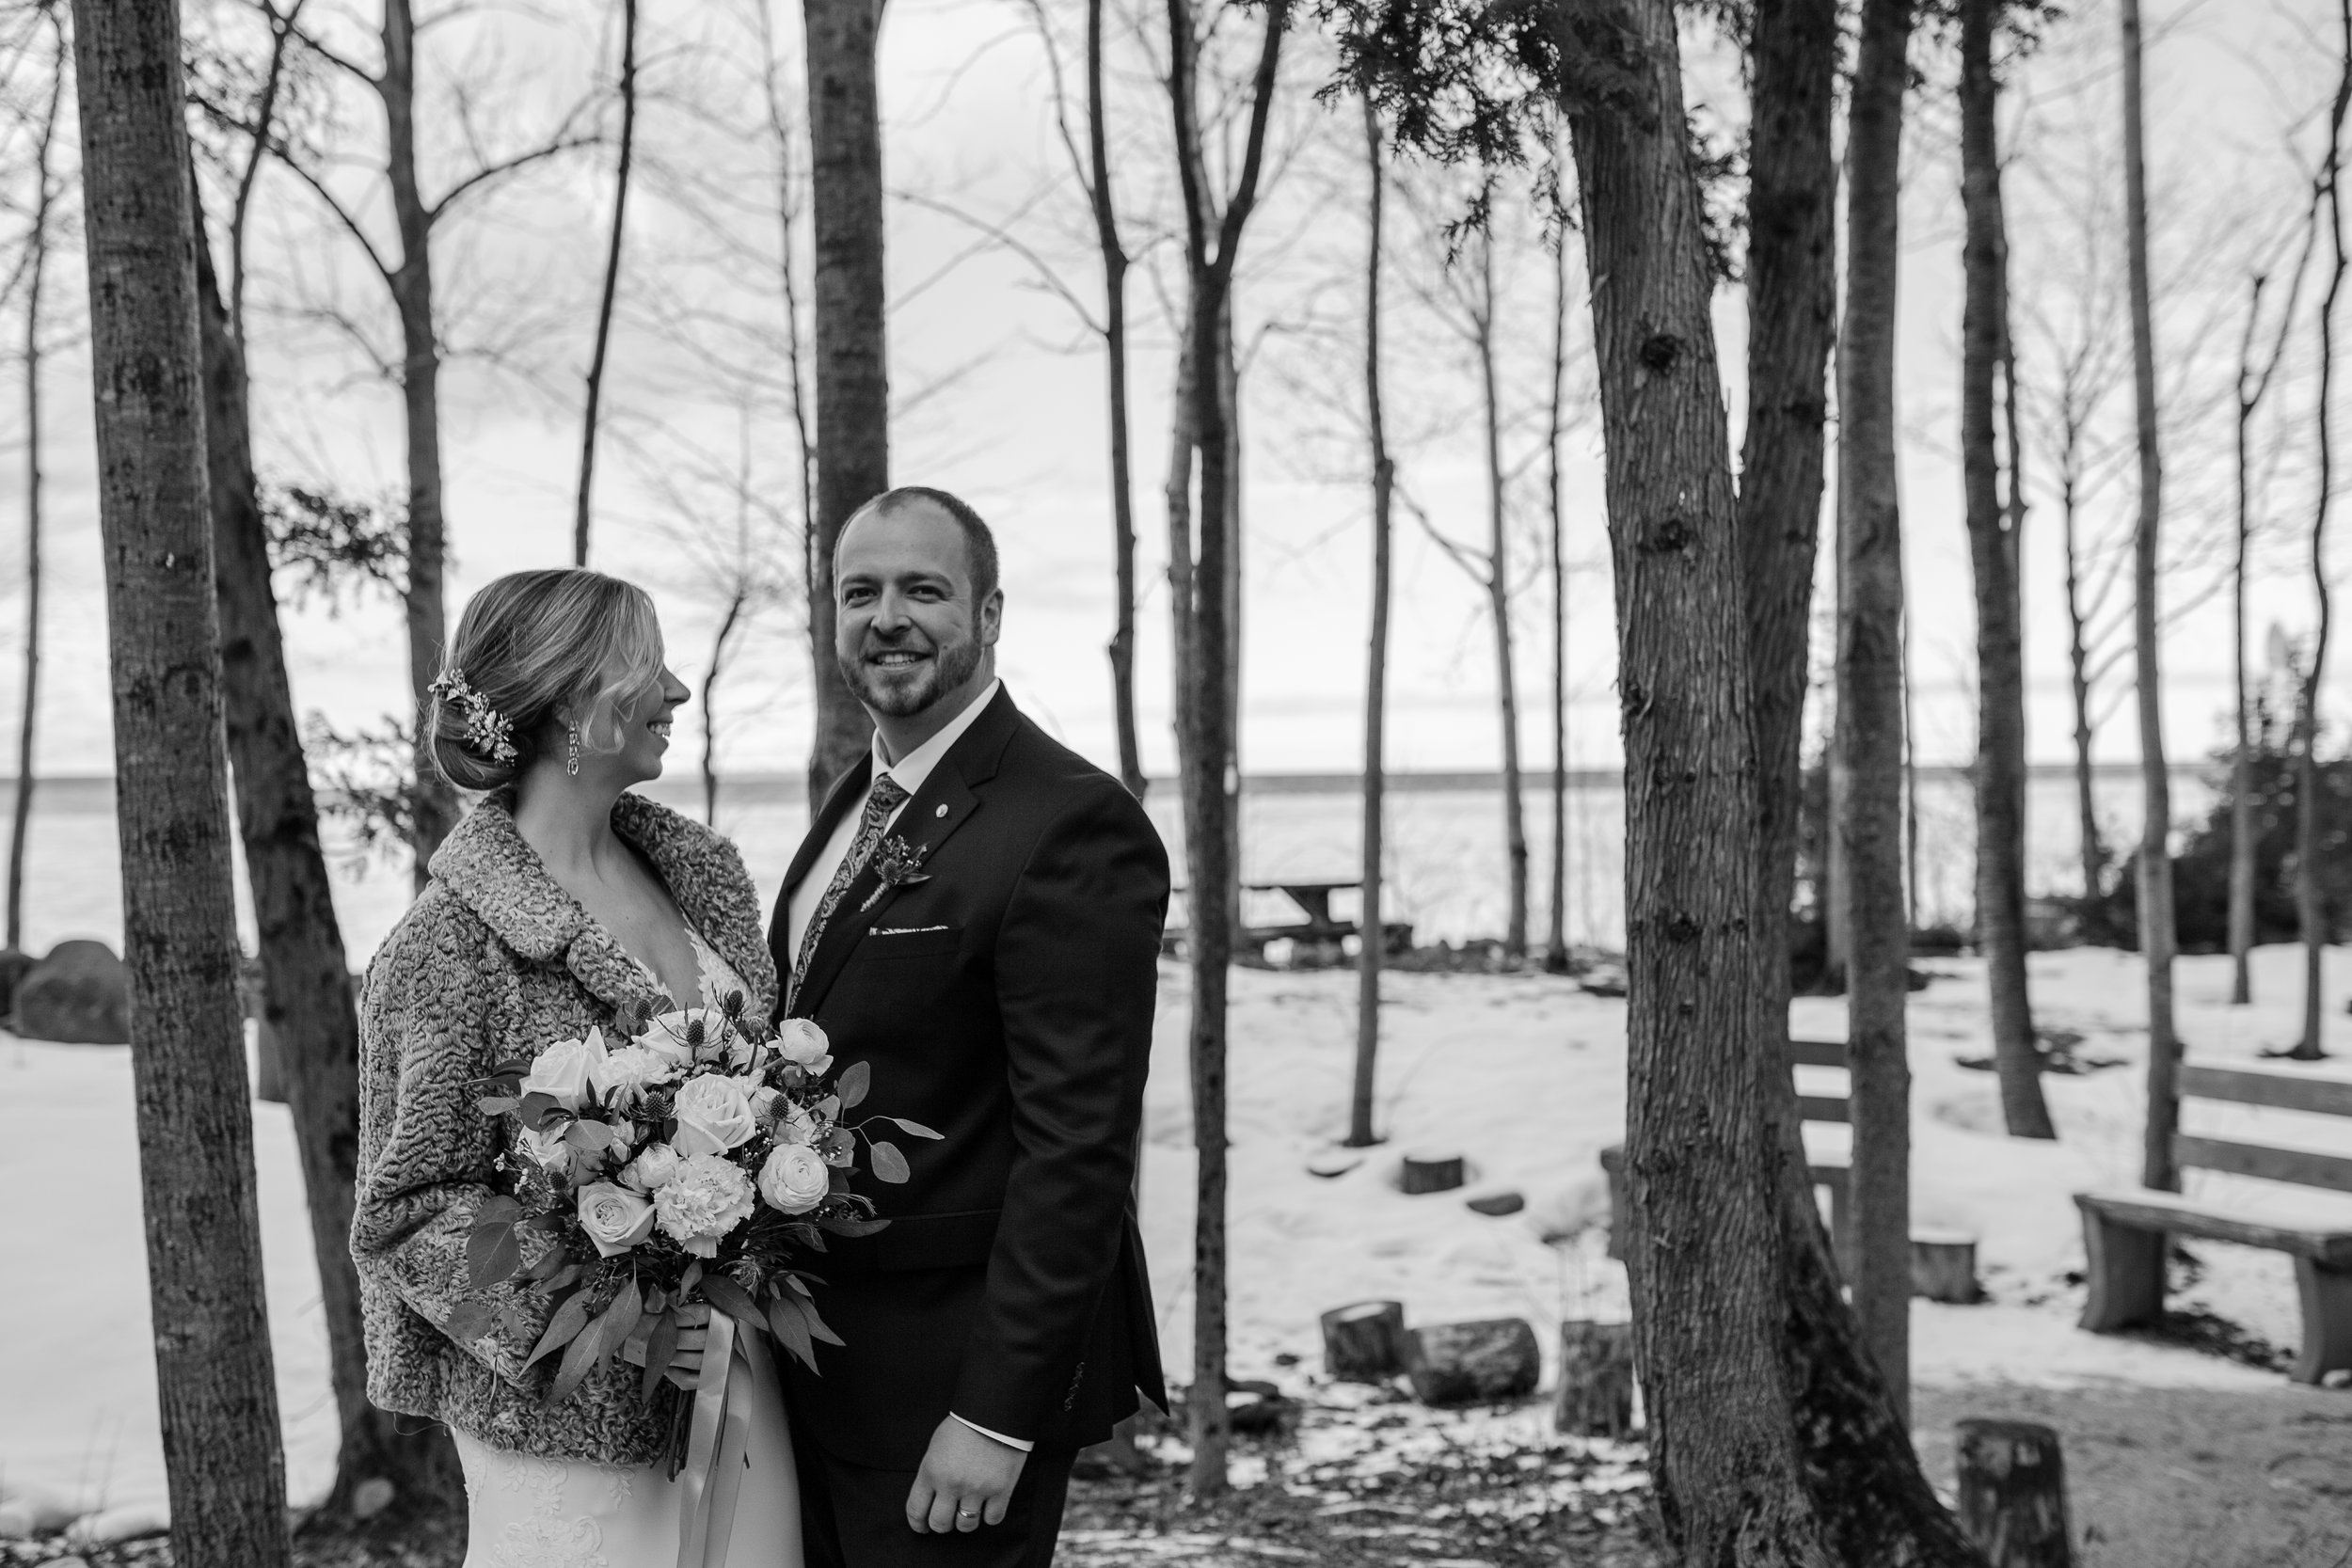 The-Griffiths-Wedding-10-03-10-175.jpg